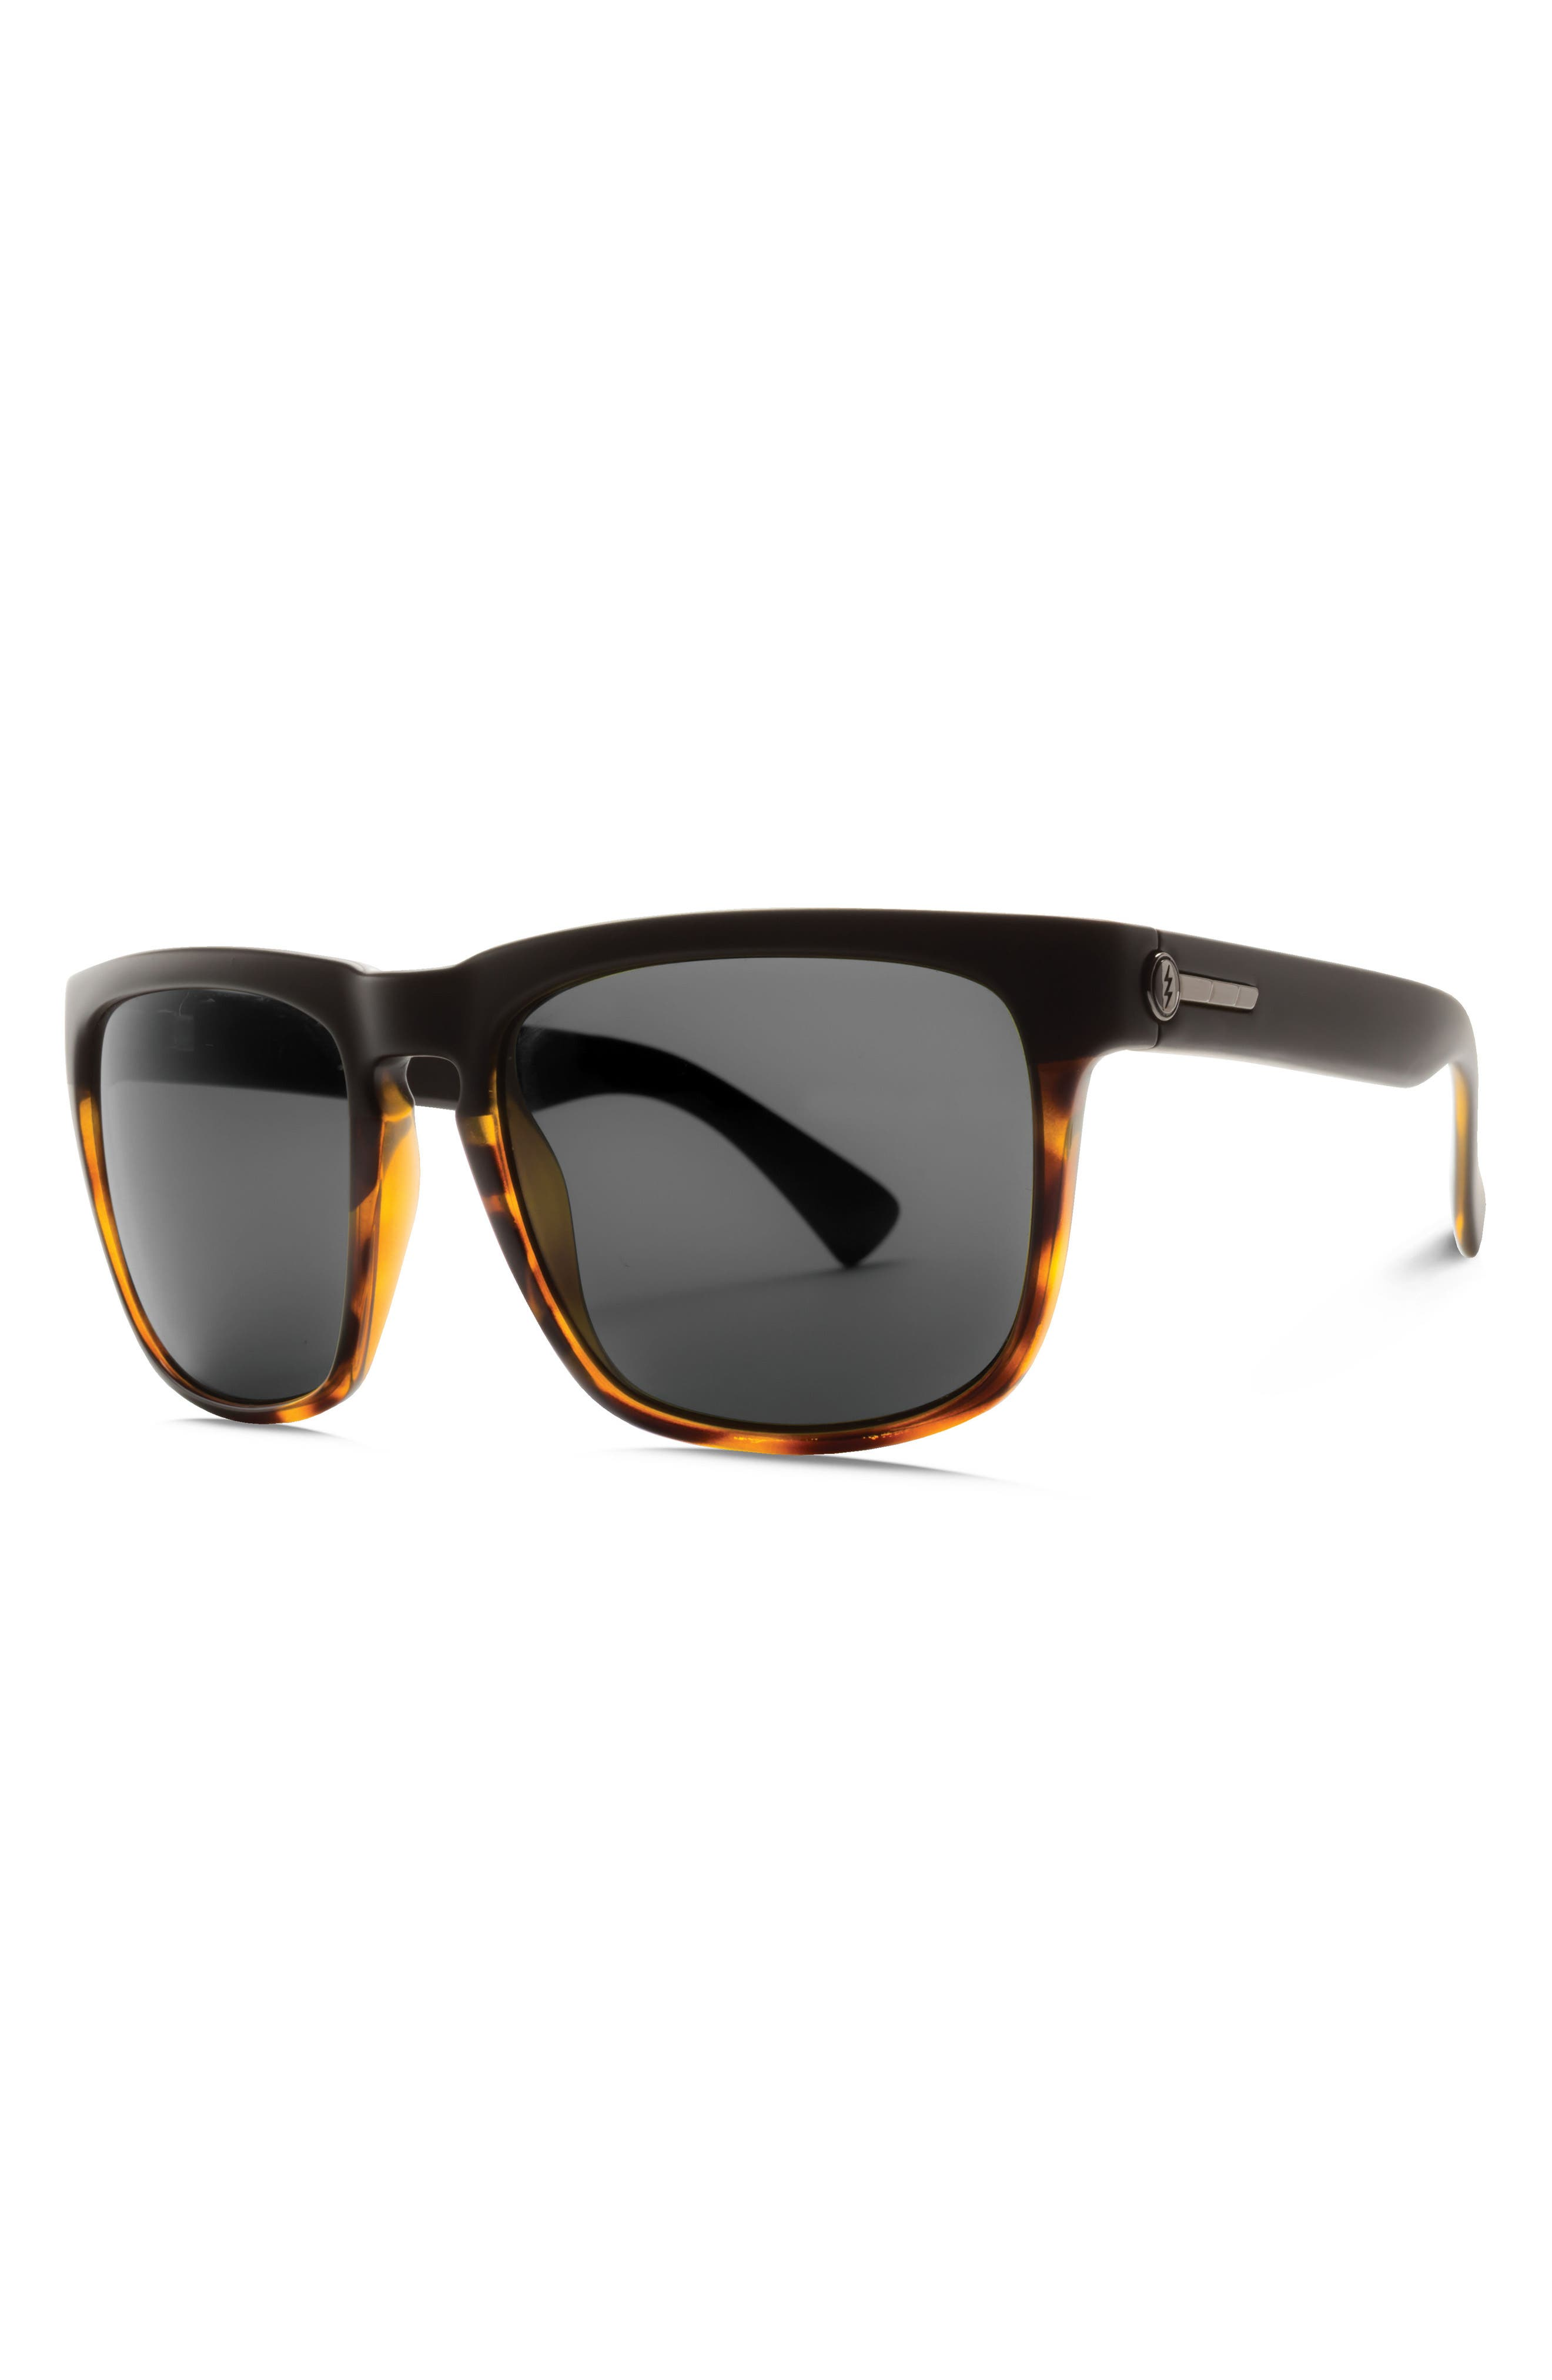 Knoxville XL 61mm Sunglasses,                             Alternate thumbnail 2, color,